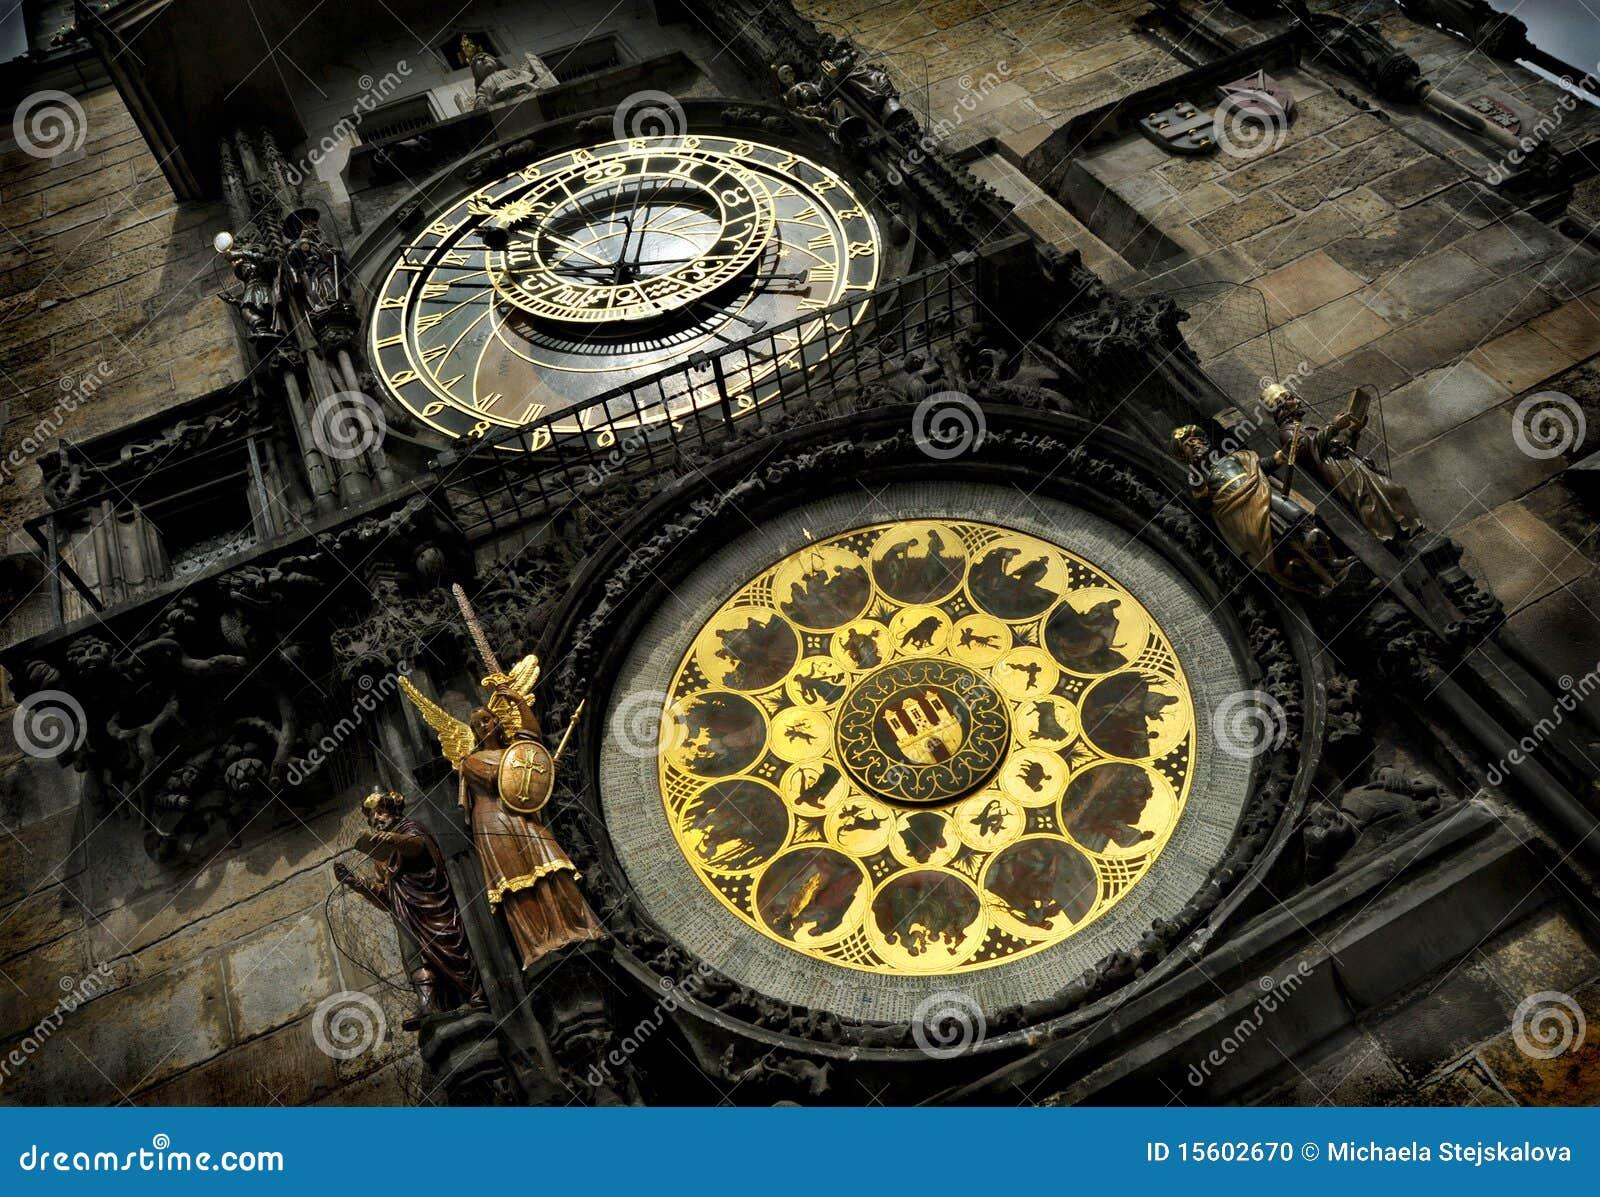 Horloge astrologique de Prague